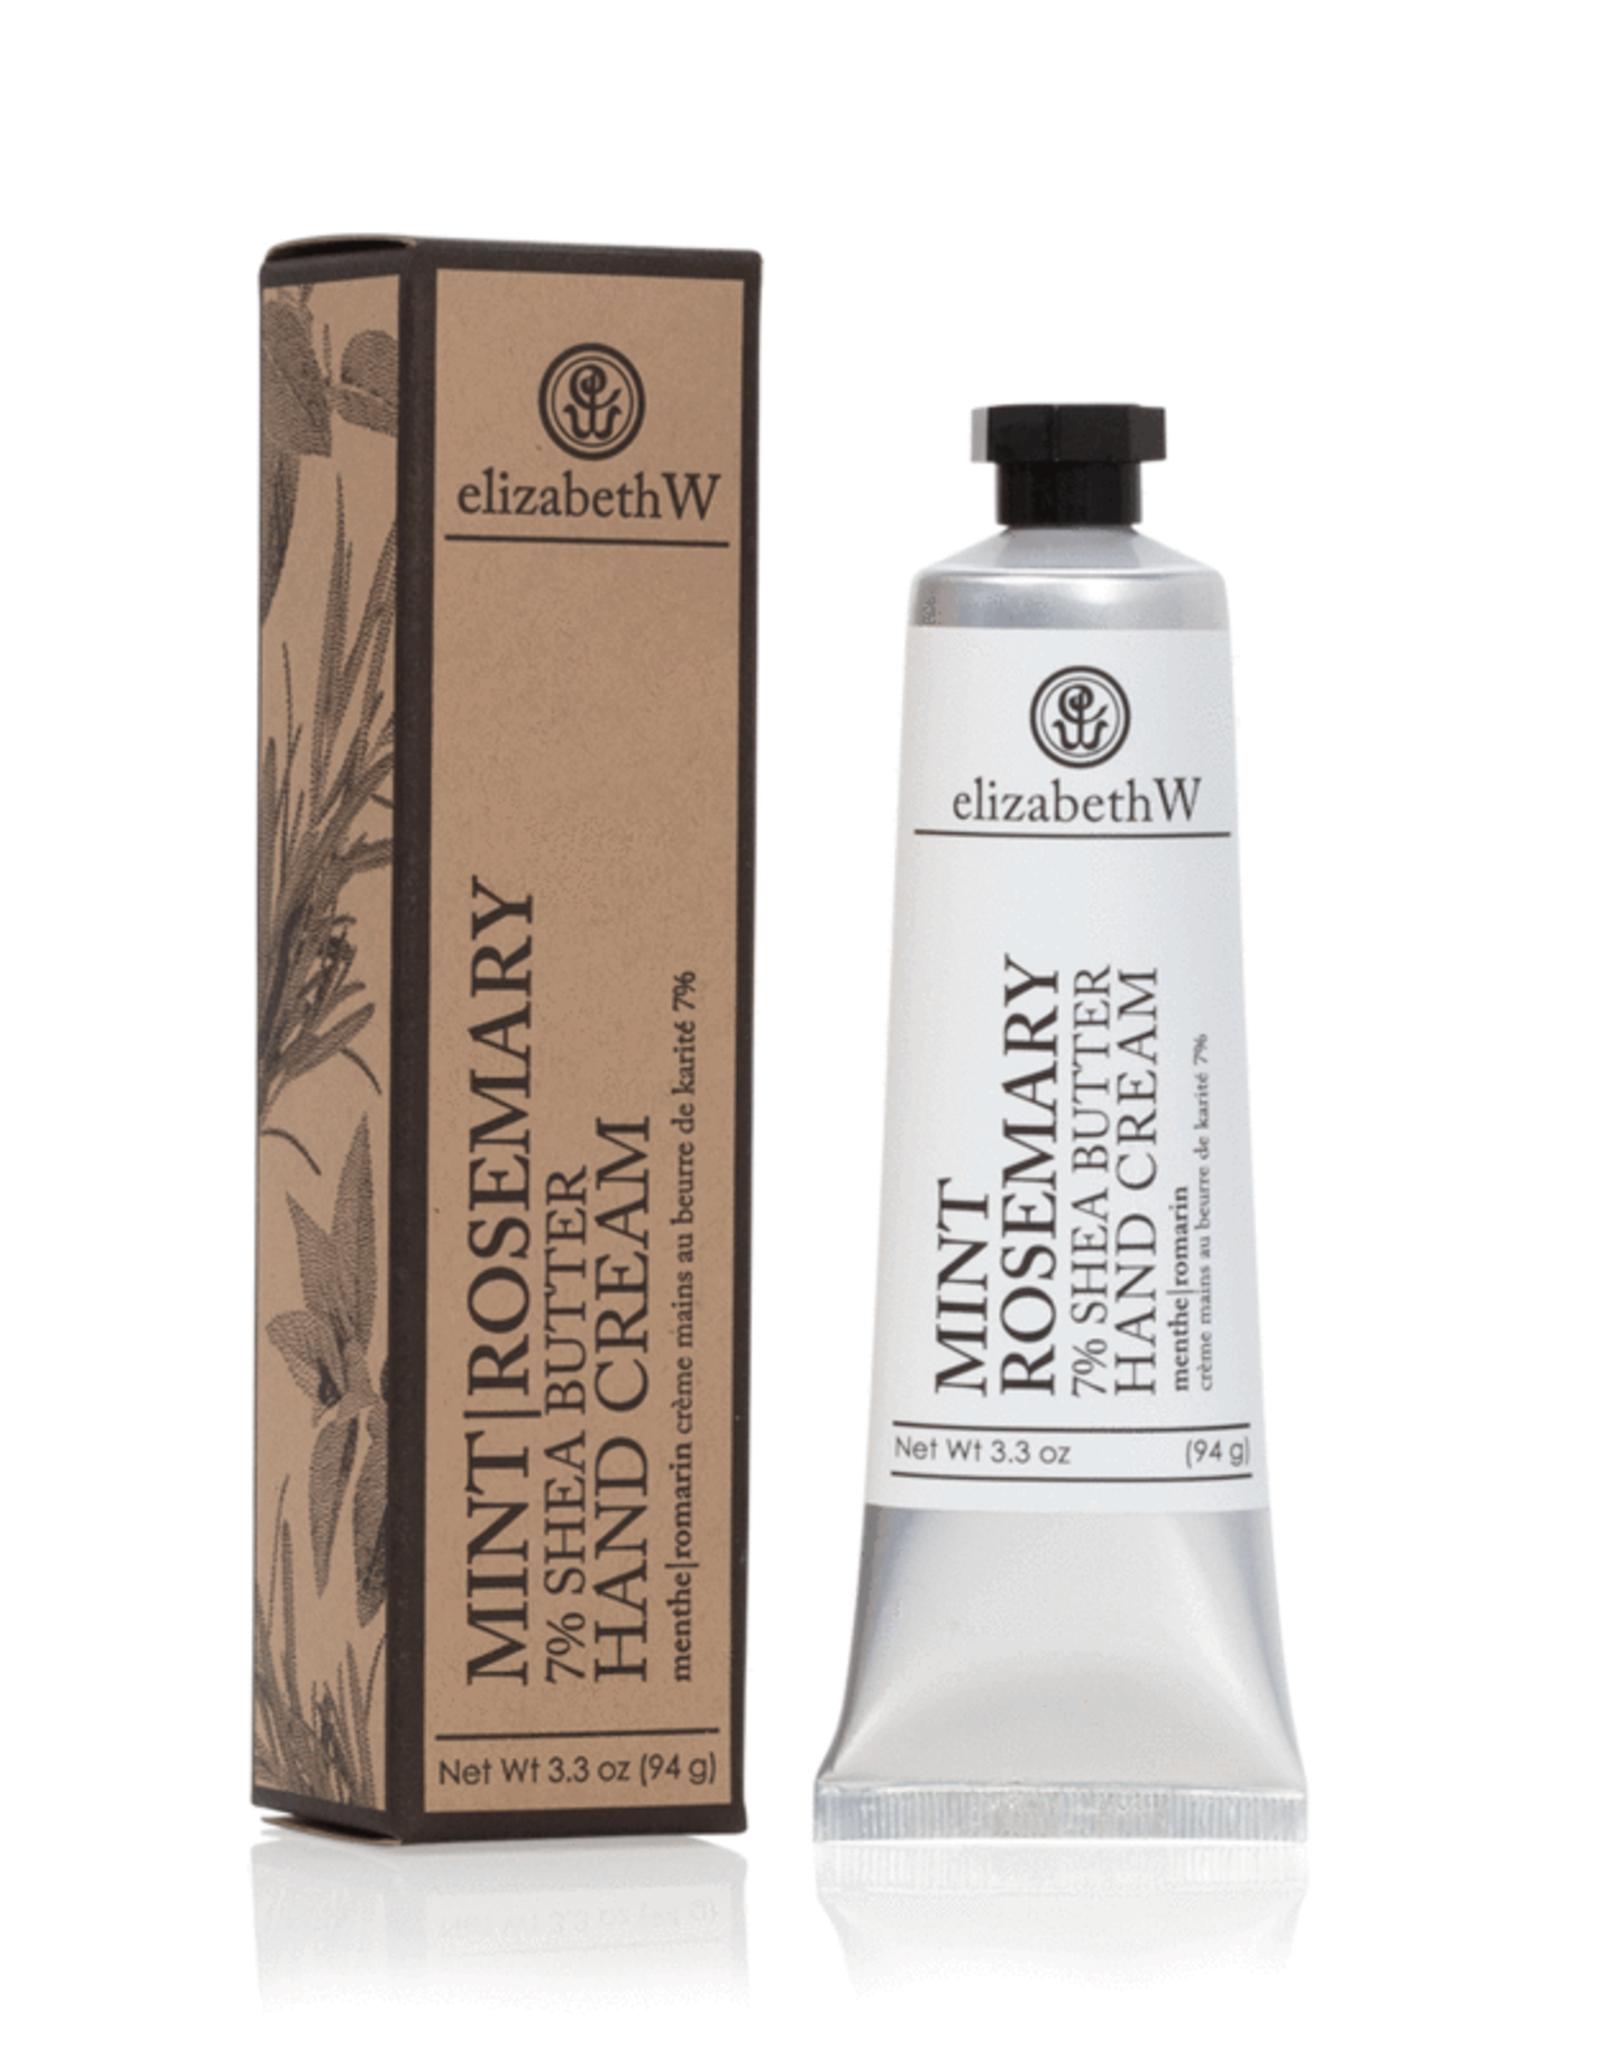 Elizabeth W Mint Rosemary Hand Cream